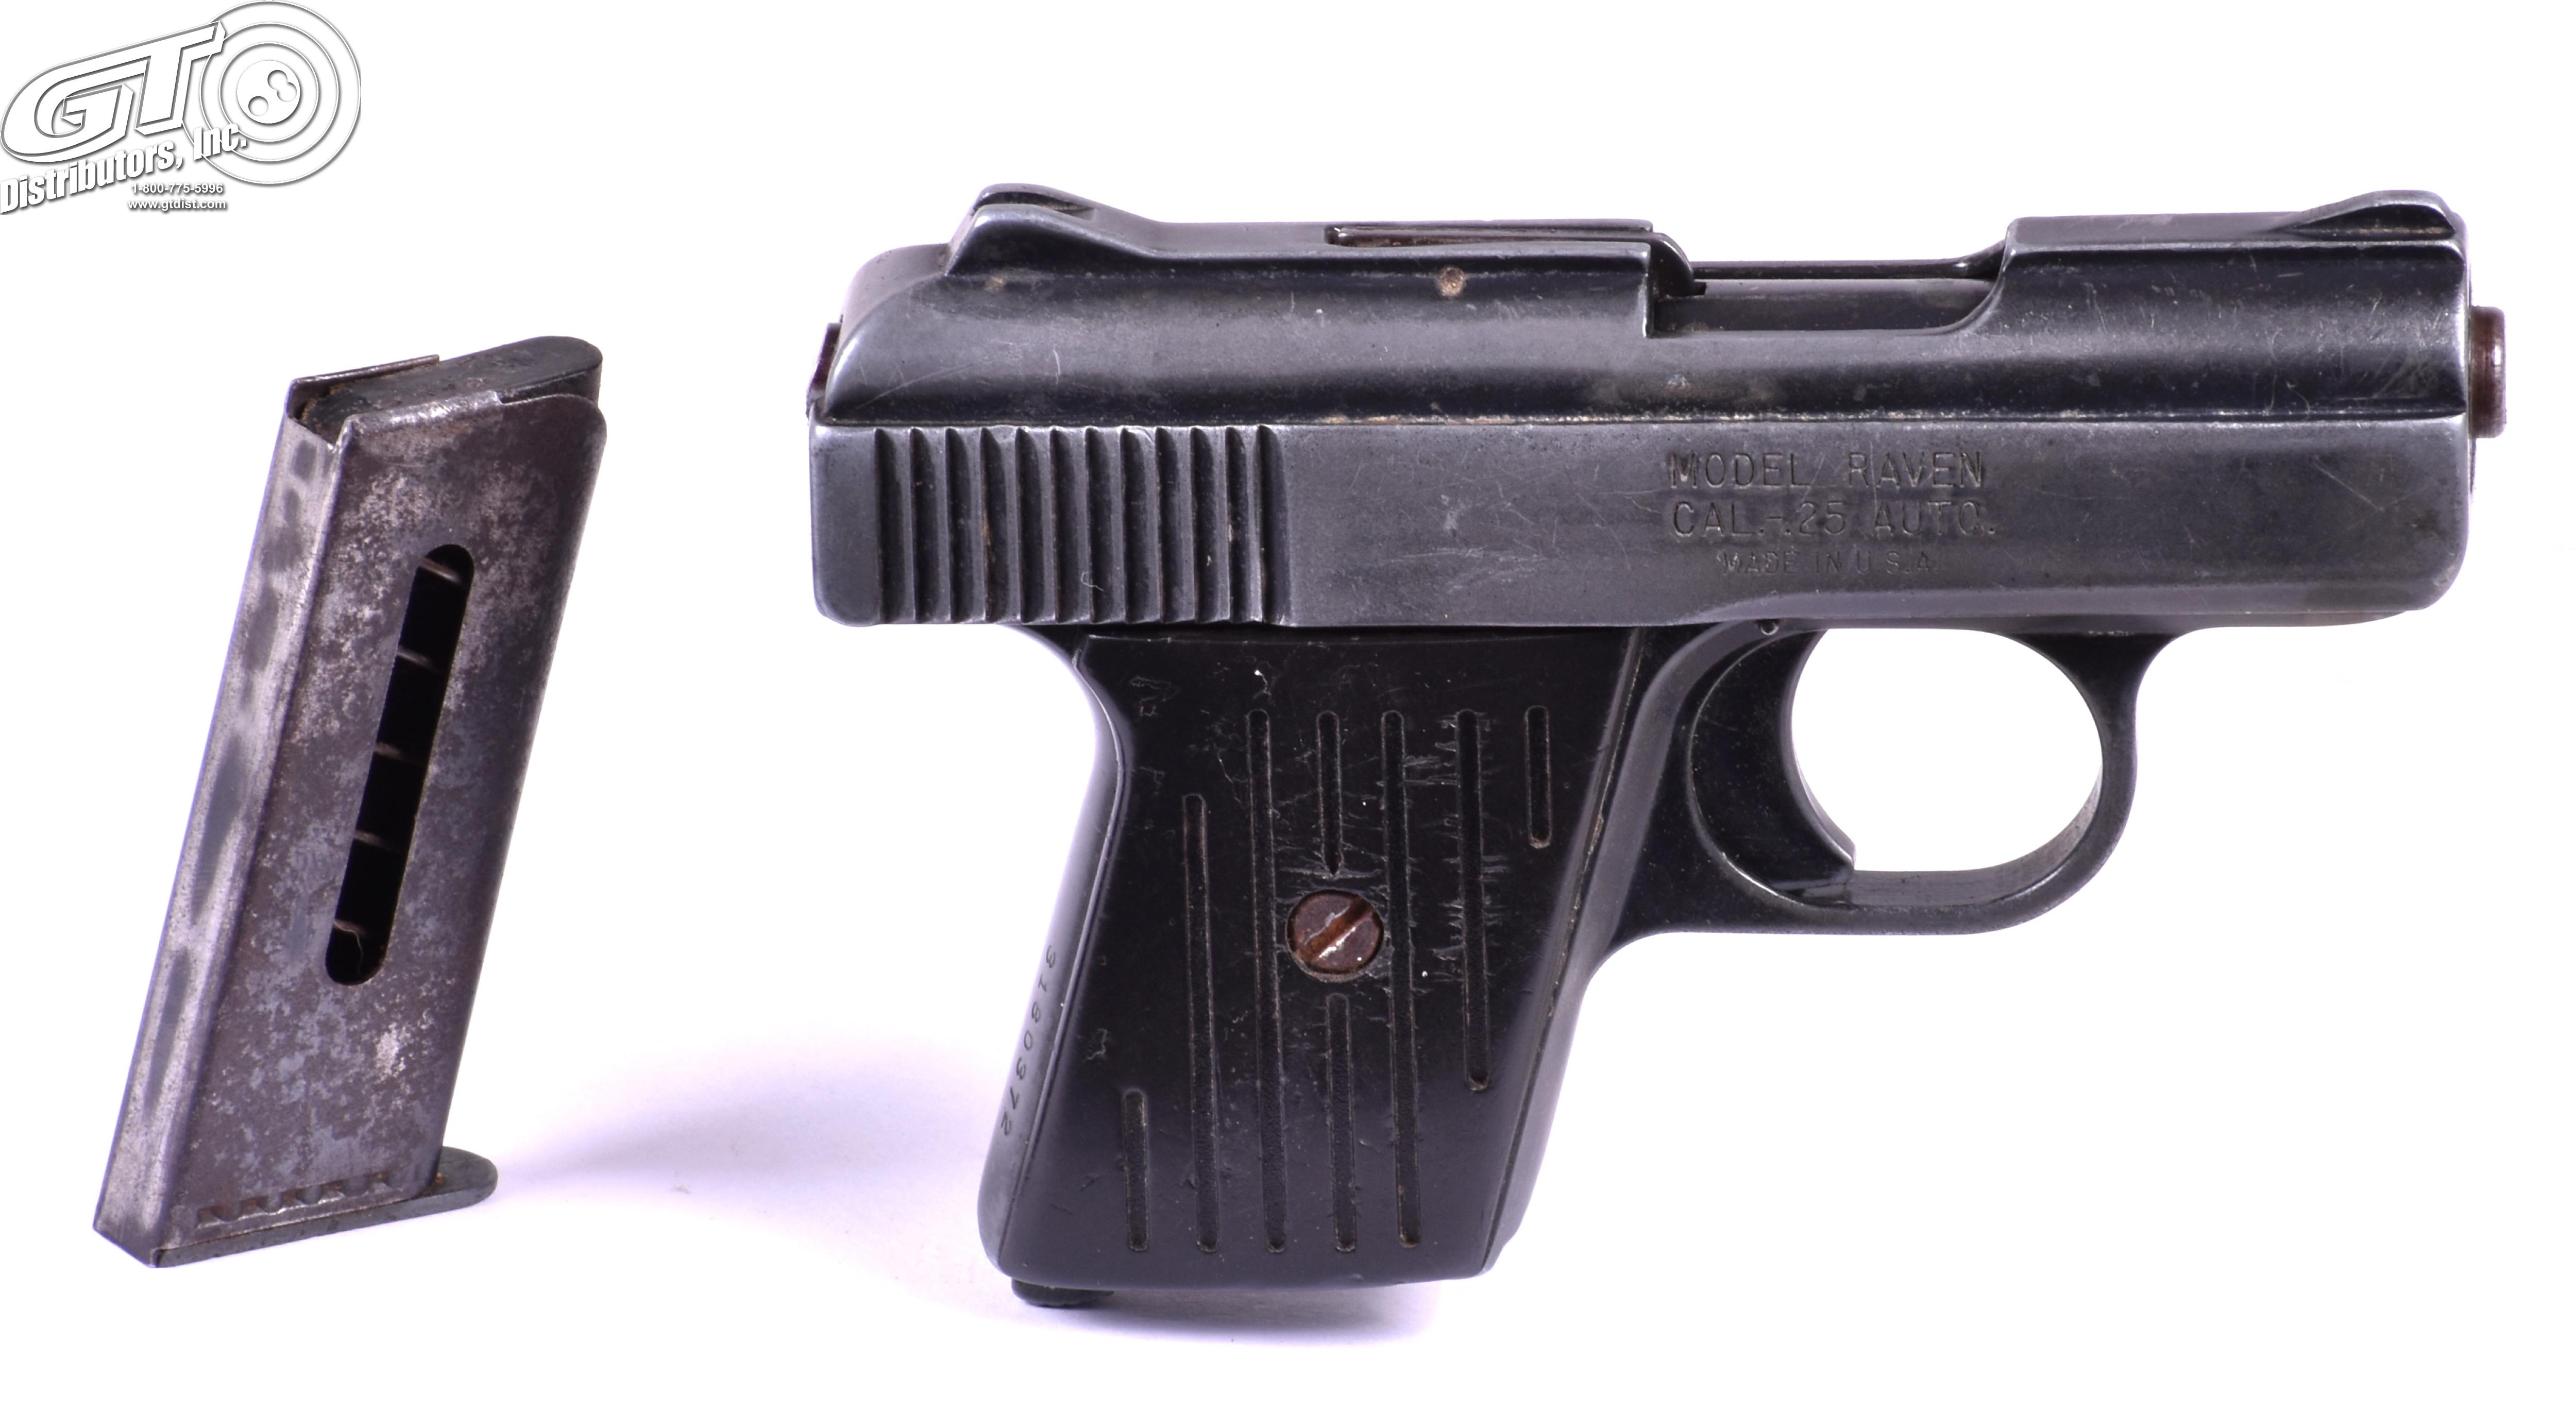 Phoenix Arms Raven  25 ACP - Semi Auto Pistols at GunBroker